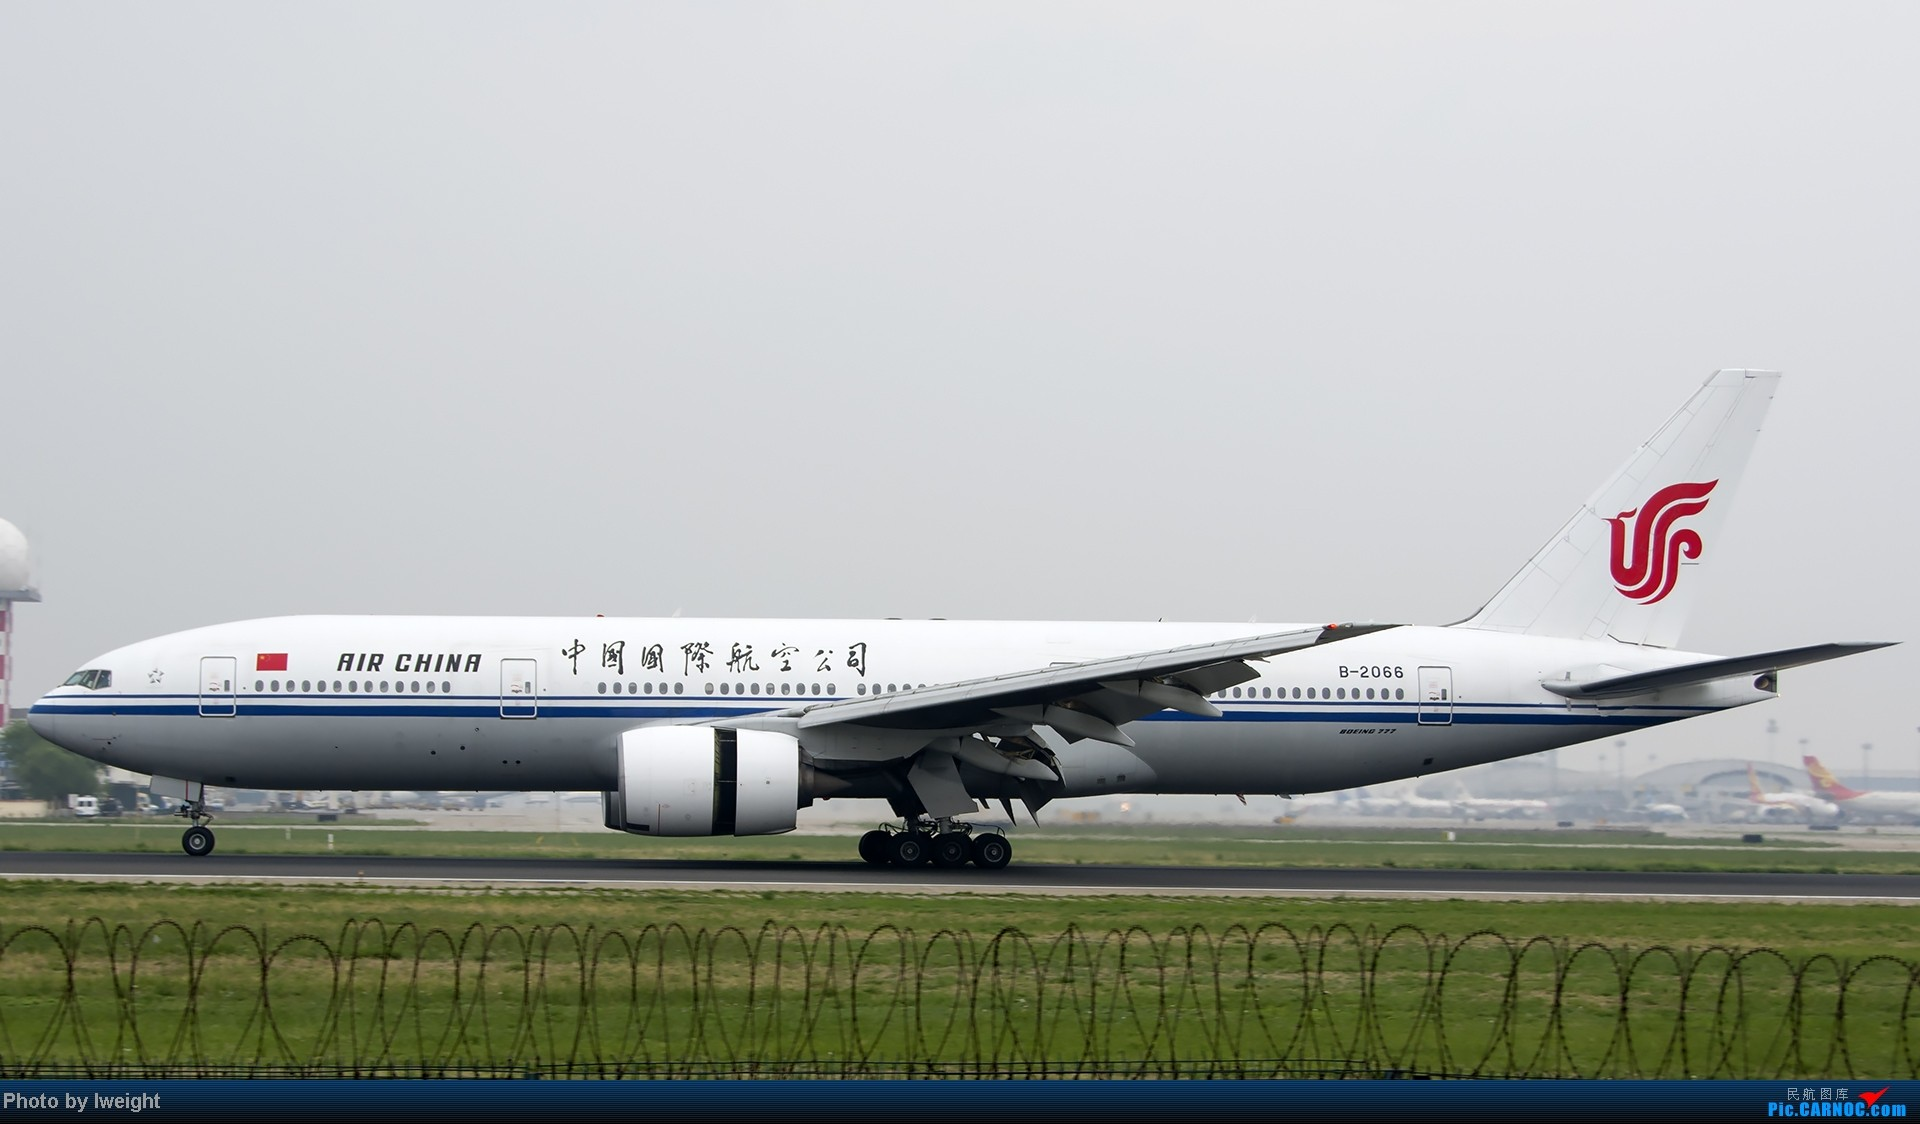 Re:[原创]休假无聊,跑道边来拍机玩(晚点的ZestAir、换装的B6100和刚交付的B2738等) BOEING 777-200 B-2066 中国北京首都机场